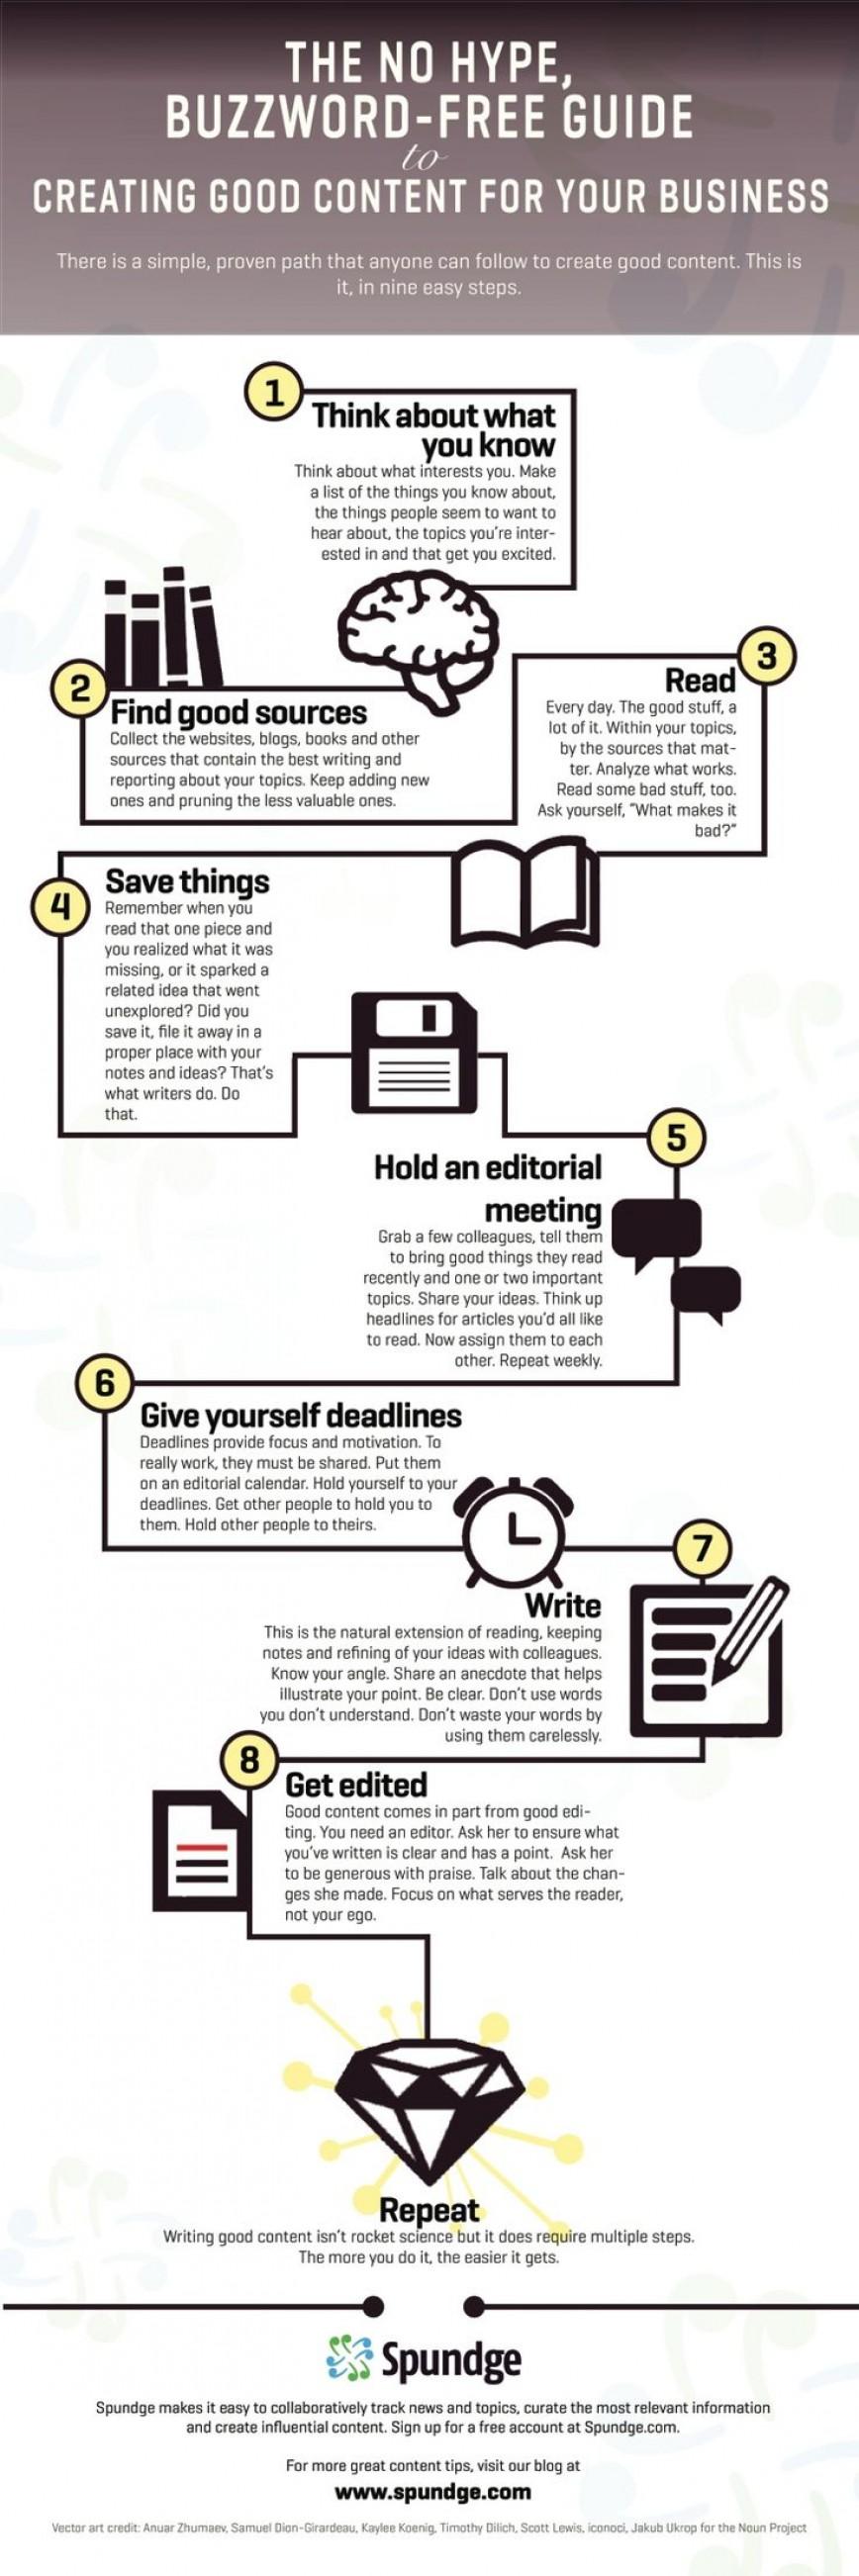 019 Essay Example How To Make An Unusual Longer Period Trick Google Docs Mac